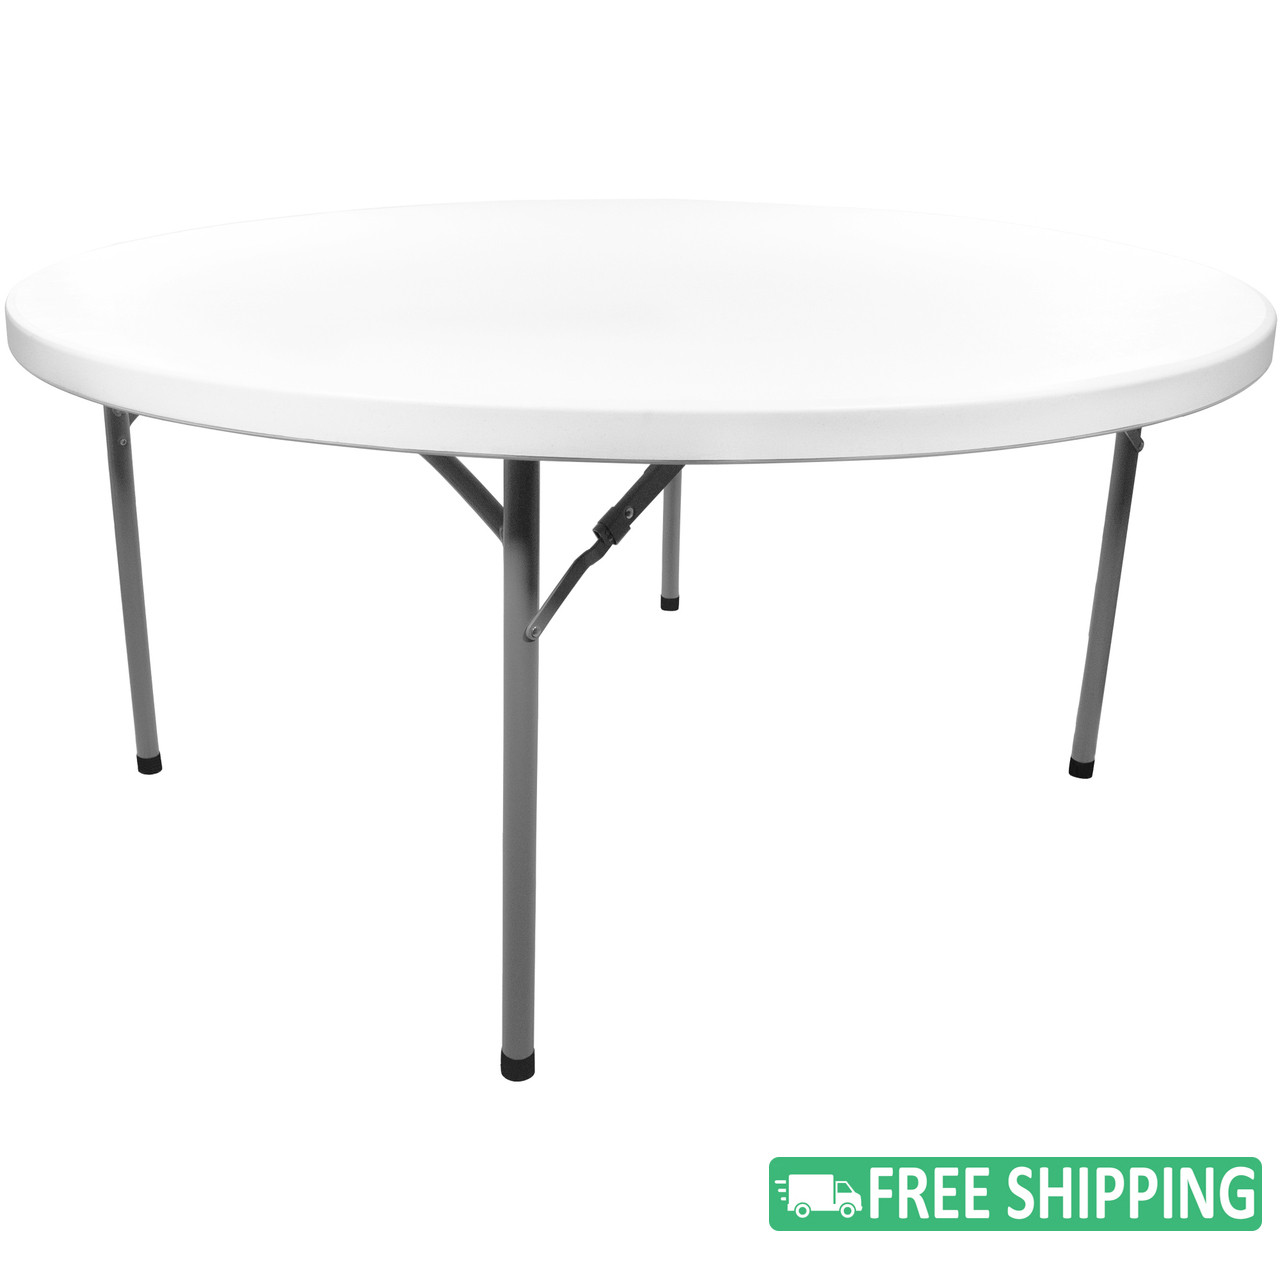 Remarkable 10 Pack Advantage 5 Ft Round White Plastic Folding Table Adv60R White 10 White Granite Download Free Architecture Designs Grimeyleaguecom